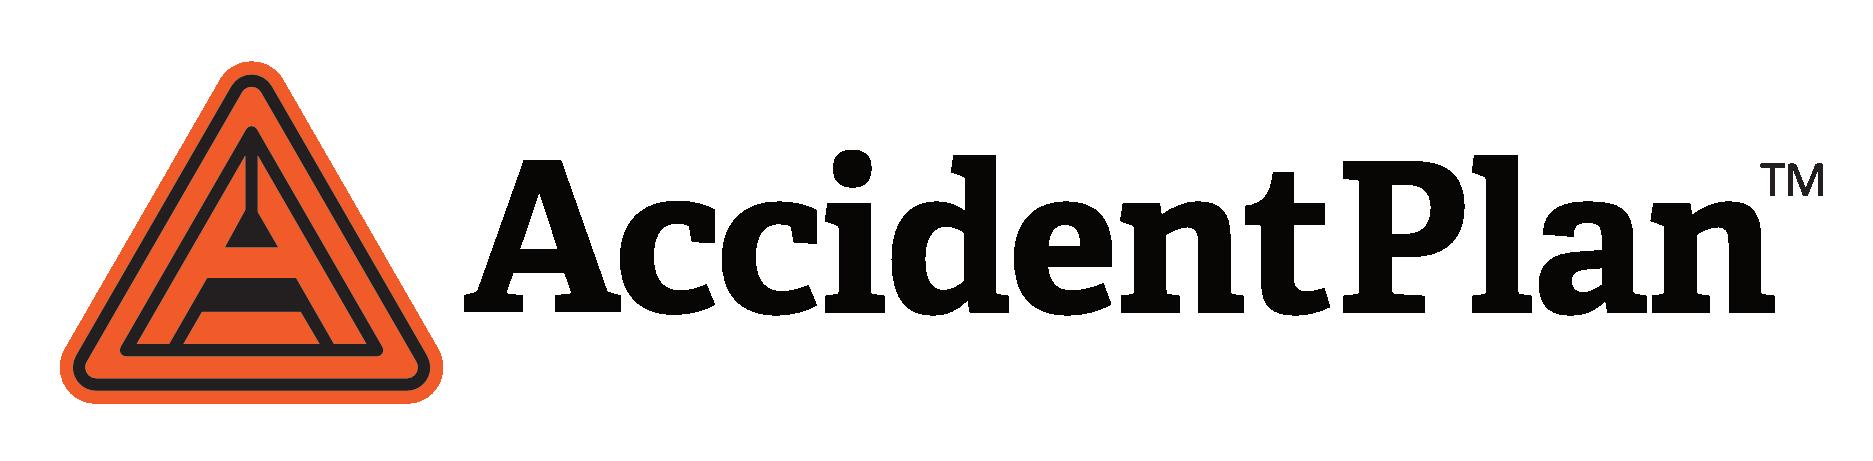 Accident Plan